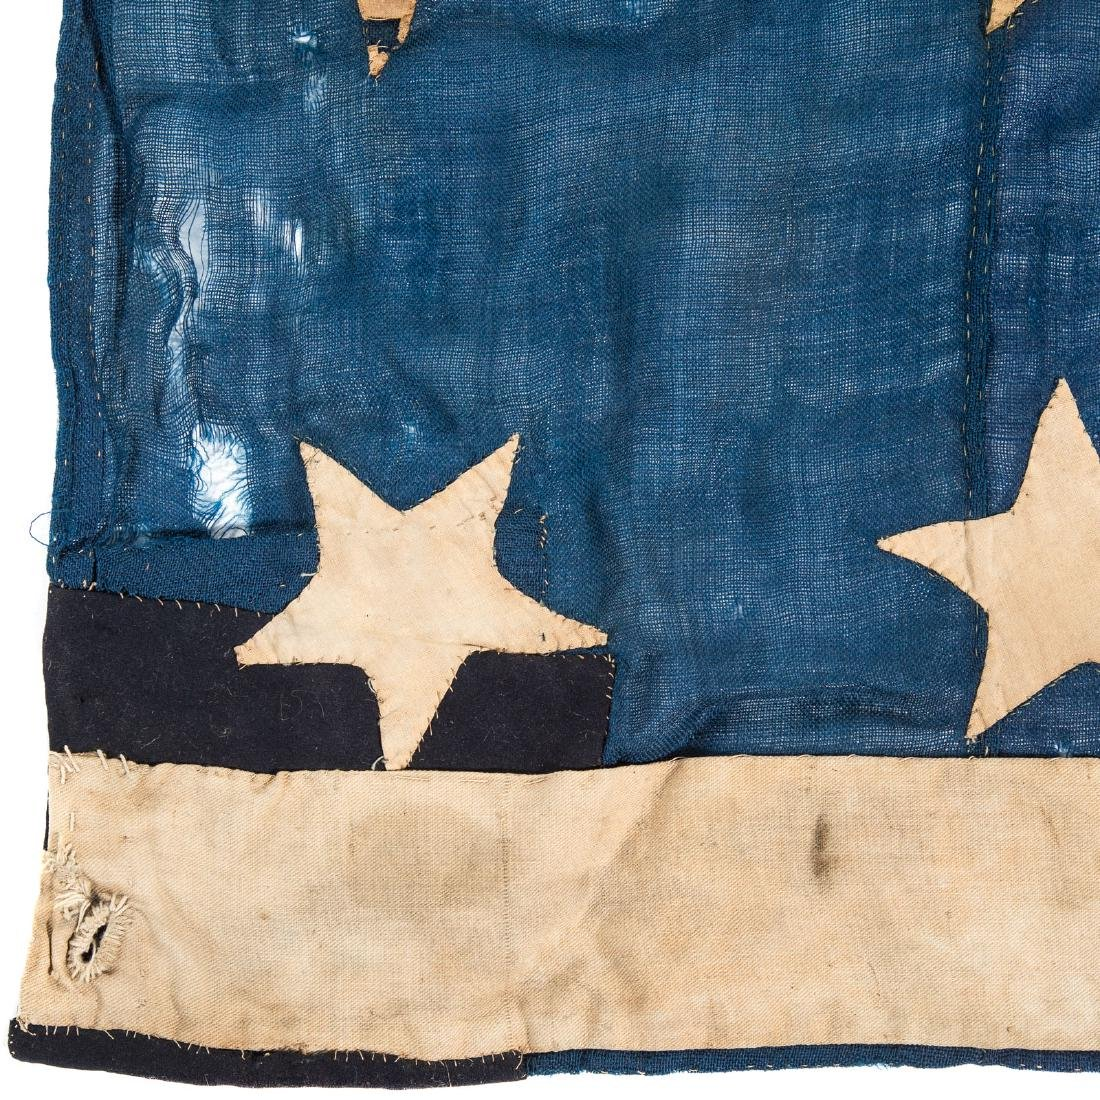 United States 34-star garrison flag - 6